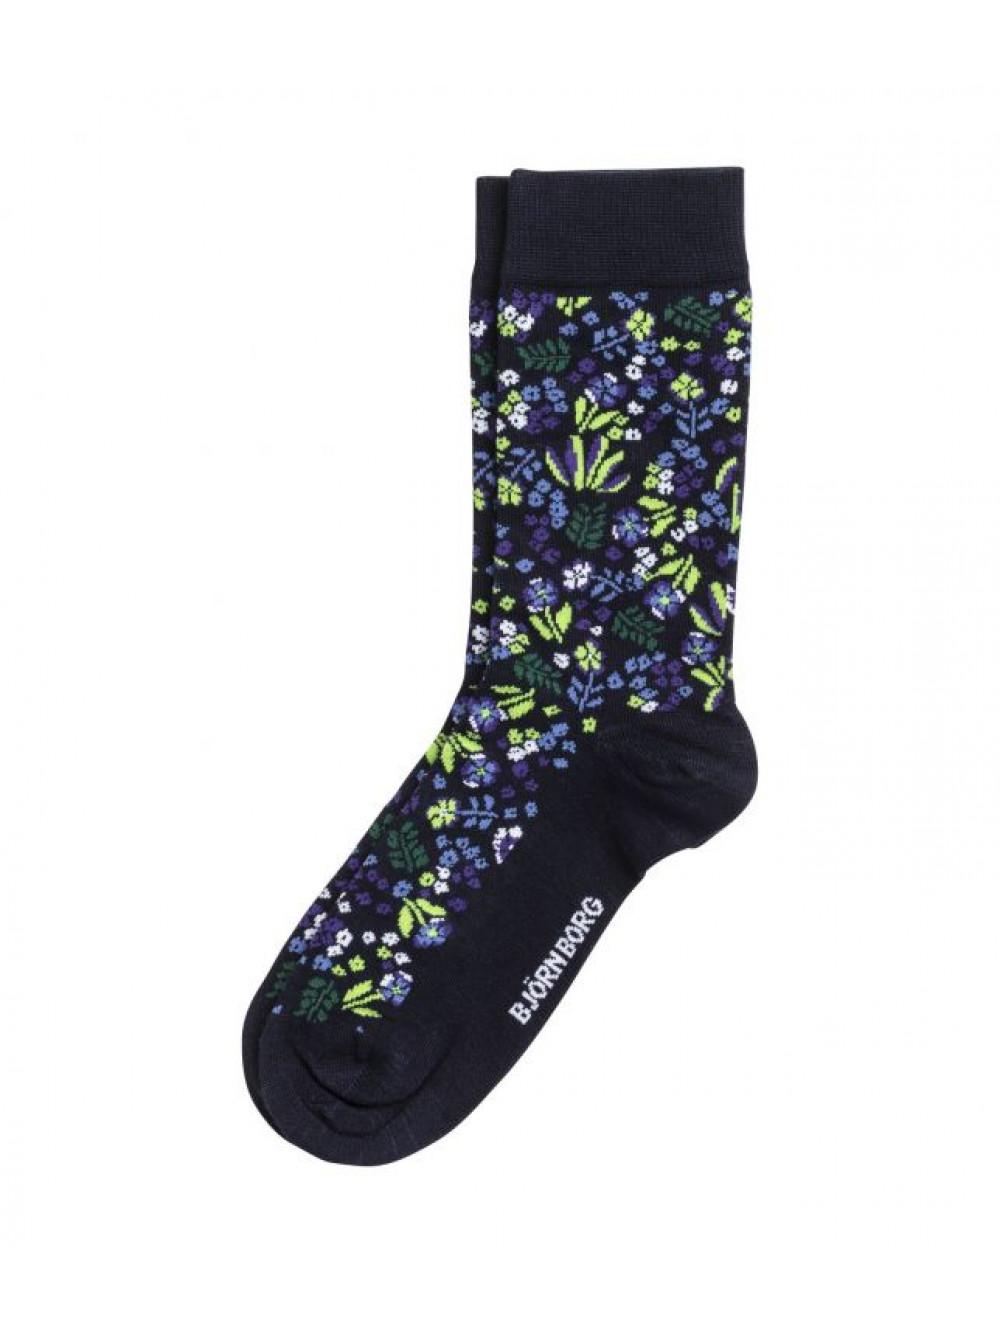 Ponožky Björn Borg Tiny Flower modré